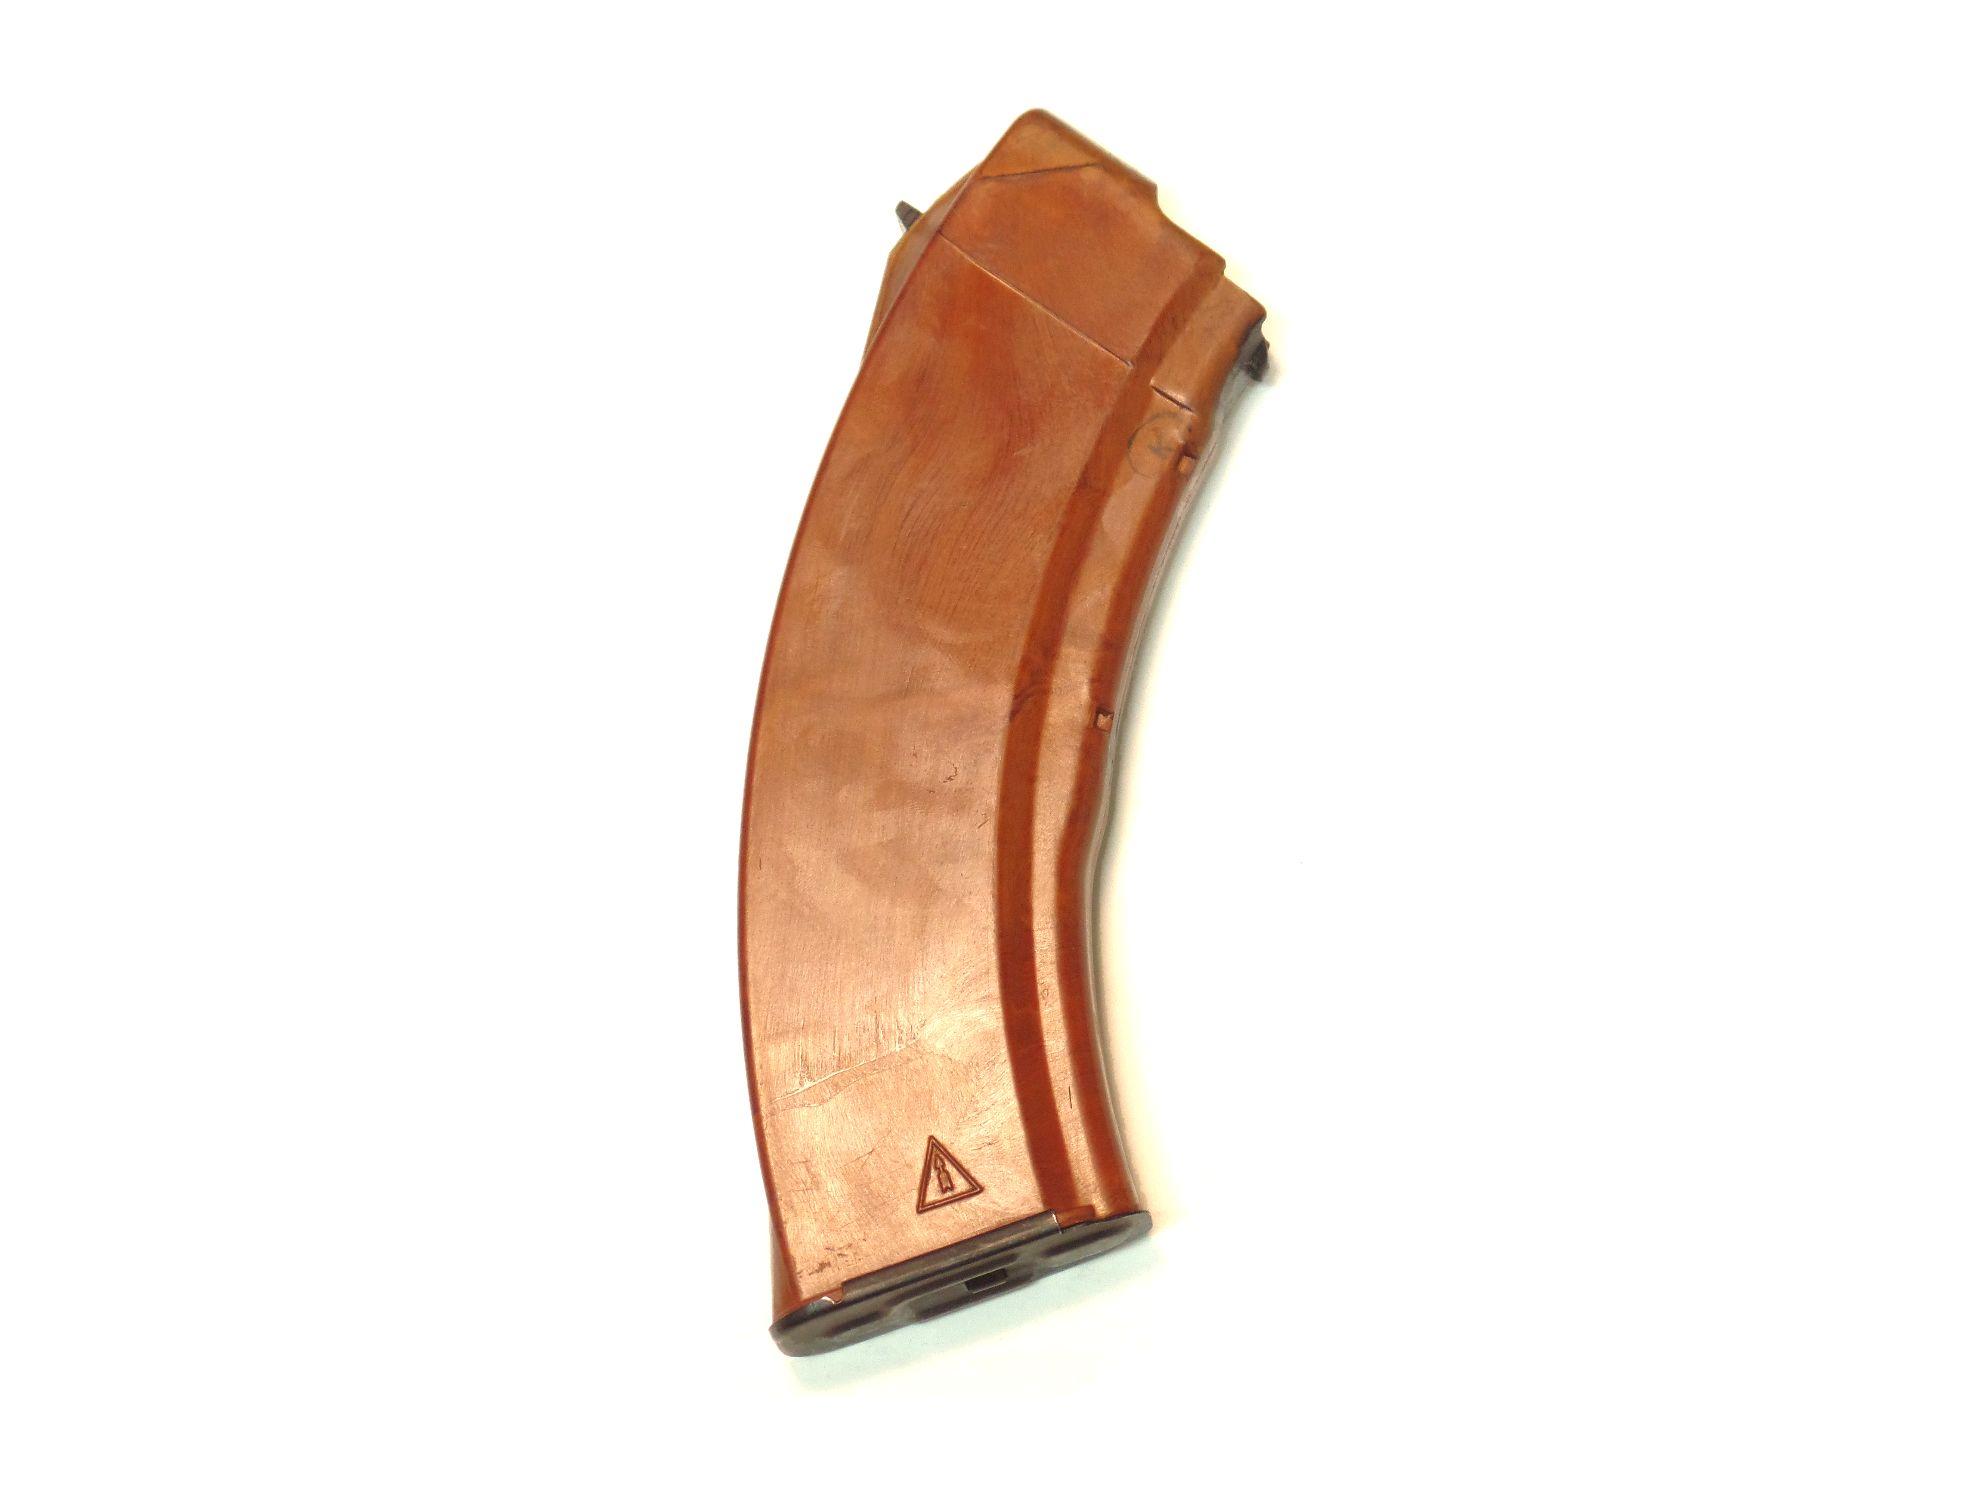 Chargeur Kalashnikov AK47 bakélite rouge calibre 7.62x39